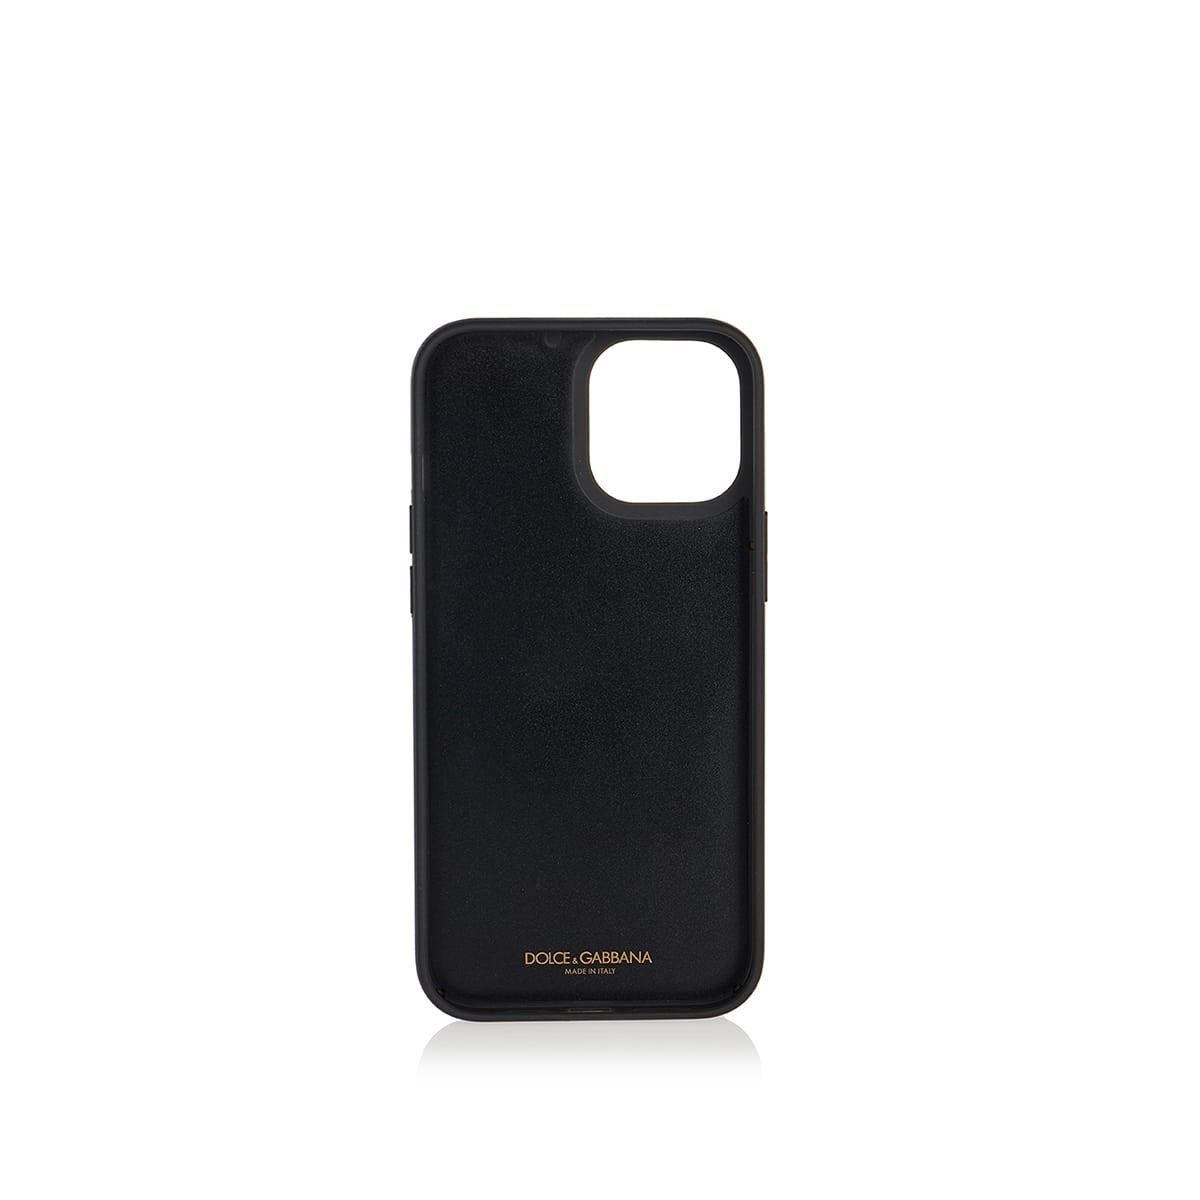 Graffiti-print iPhone 12 Pro Max case